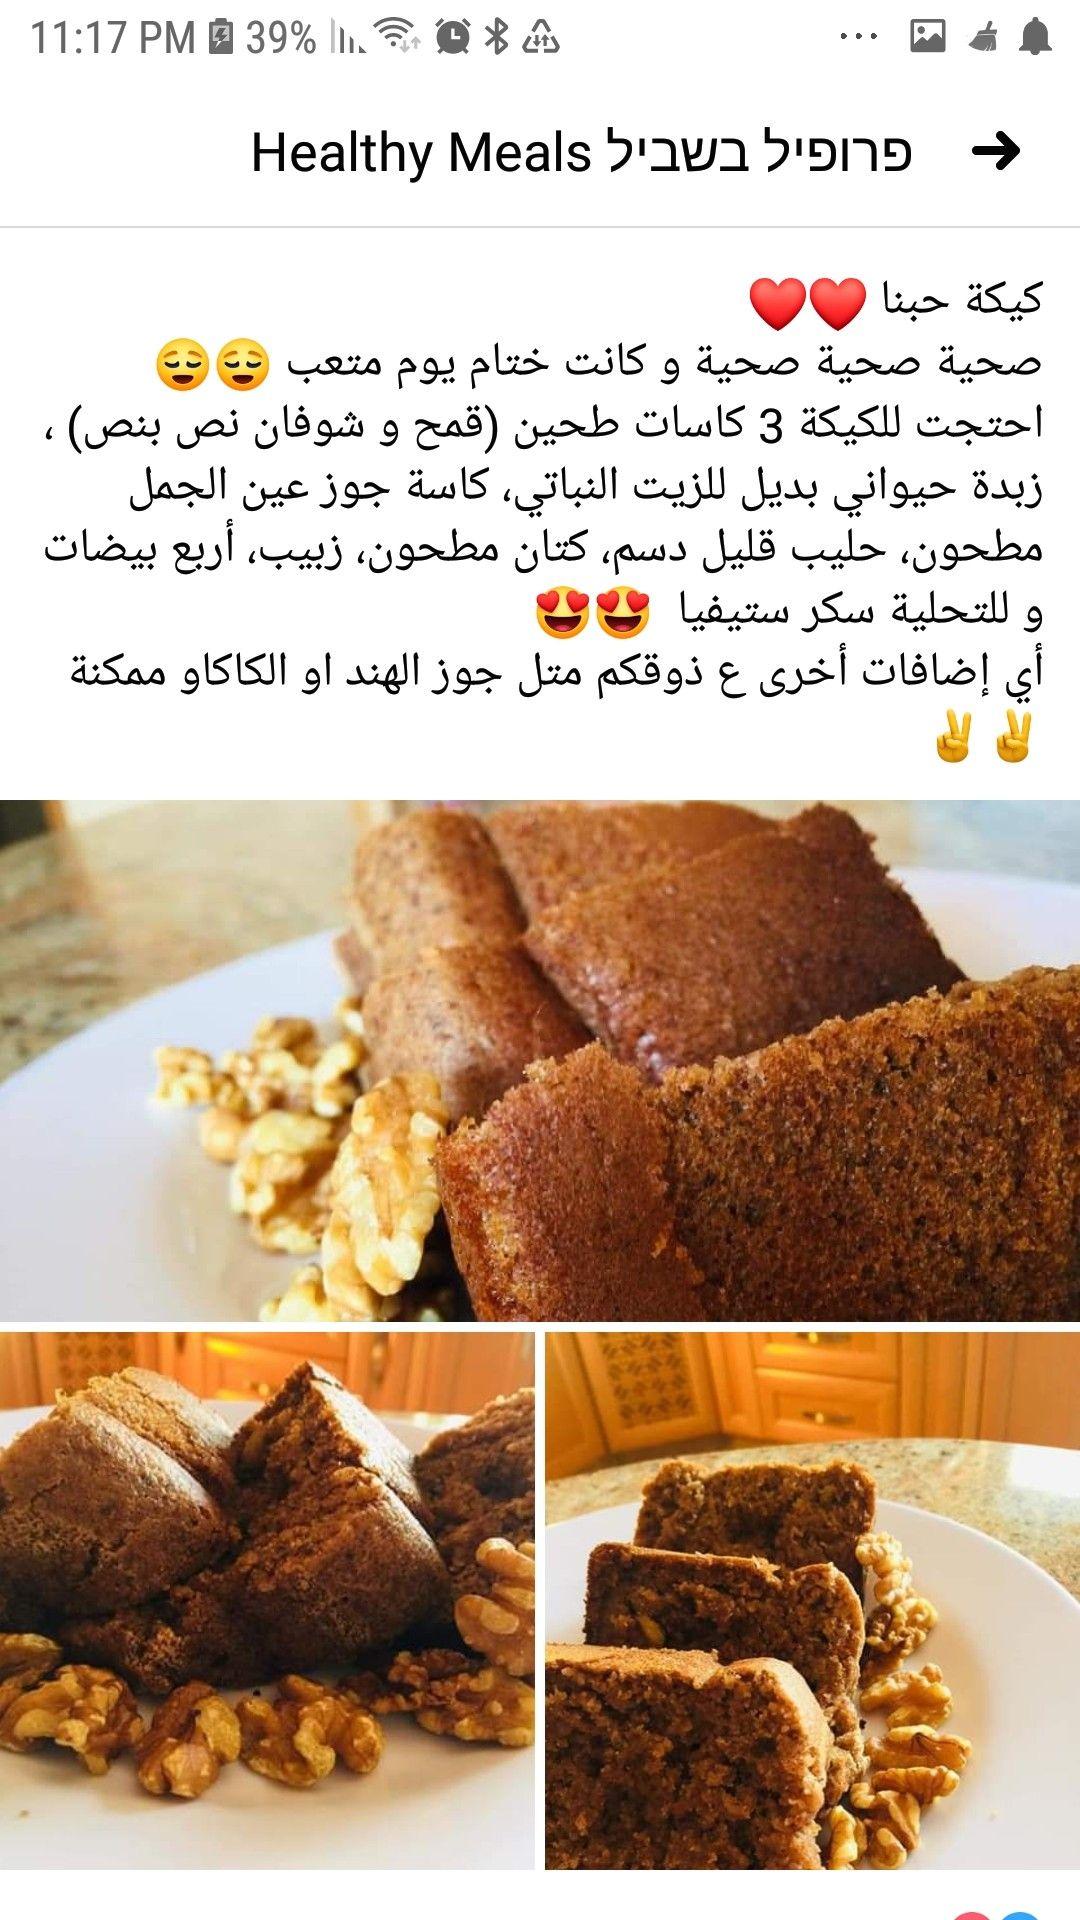 Pin By Neso Dagash On وصفات للريجيم Food Desserts Healthy Recipes